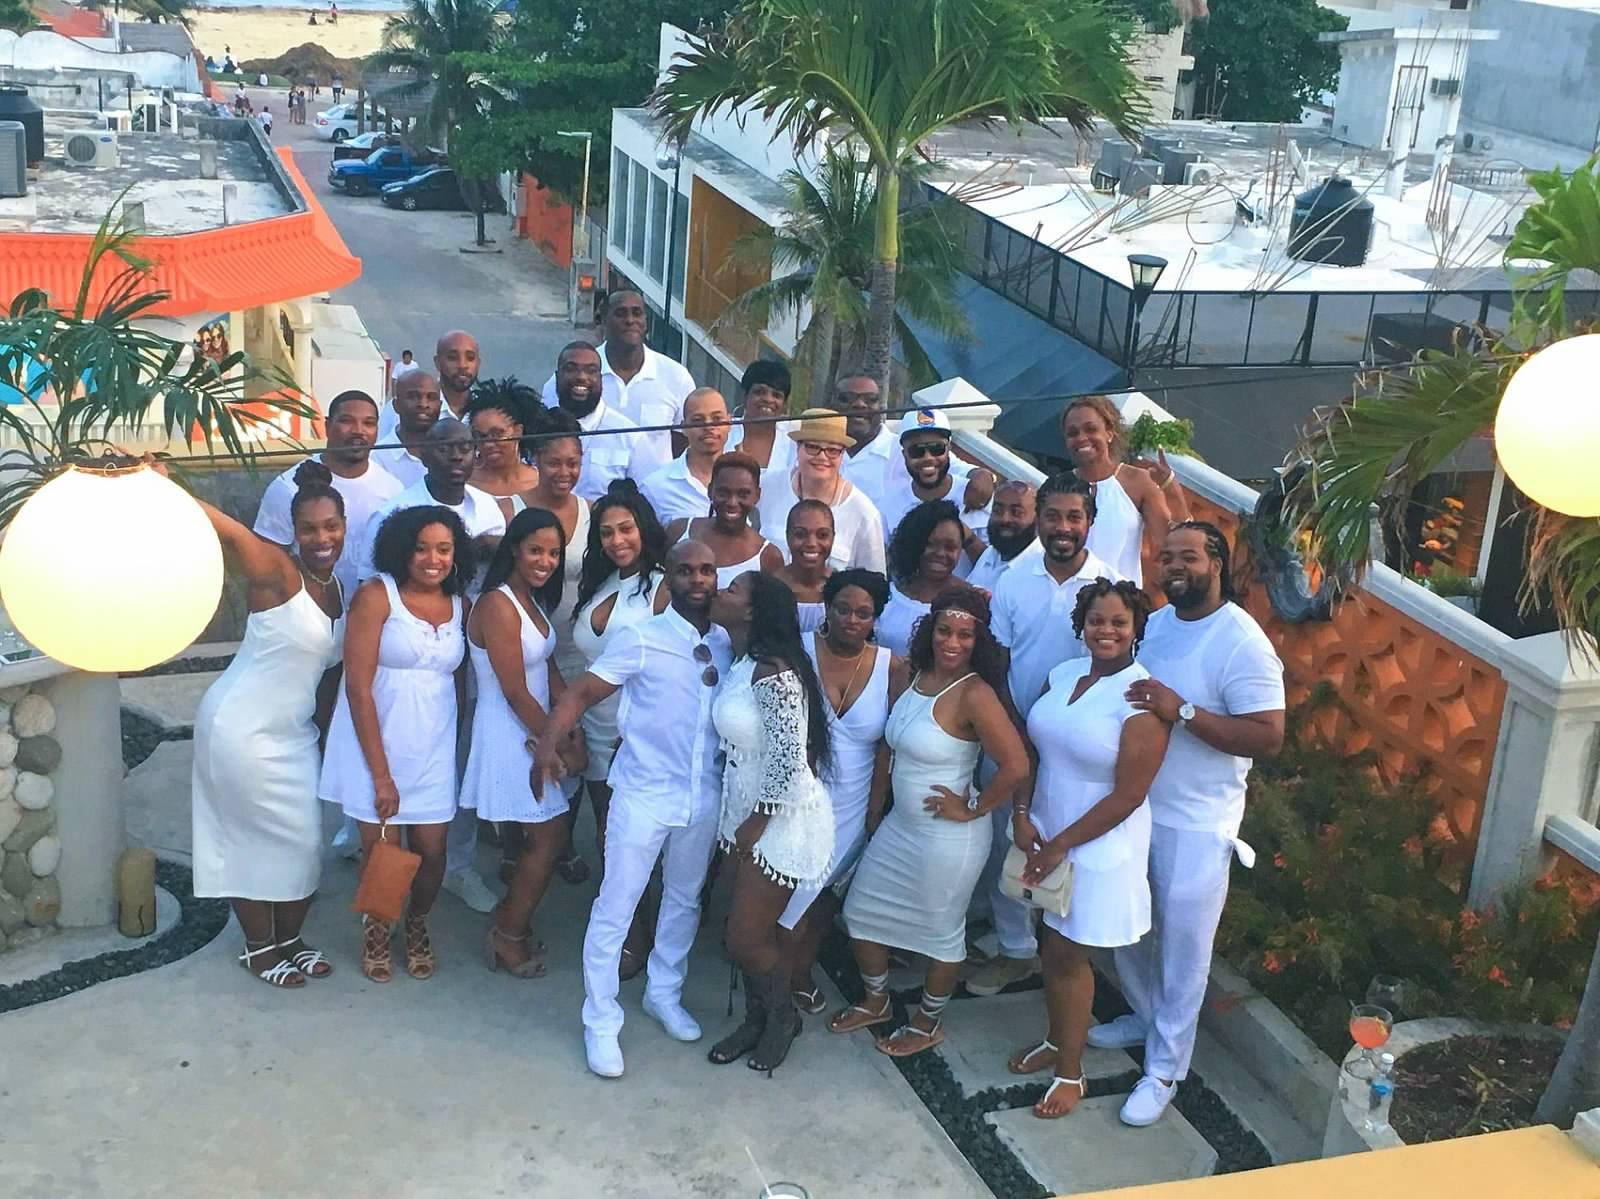 Black Destination Bride - BlackDesti Wedding Countdown Journal - Bridefriends Podcast - 1 Playa del Carmen Mexico - Carboncitos Rooftop Party Dinner.jpeg